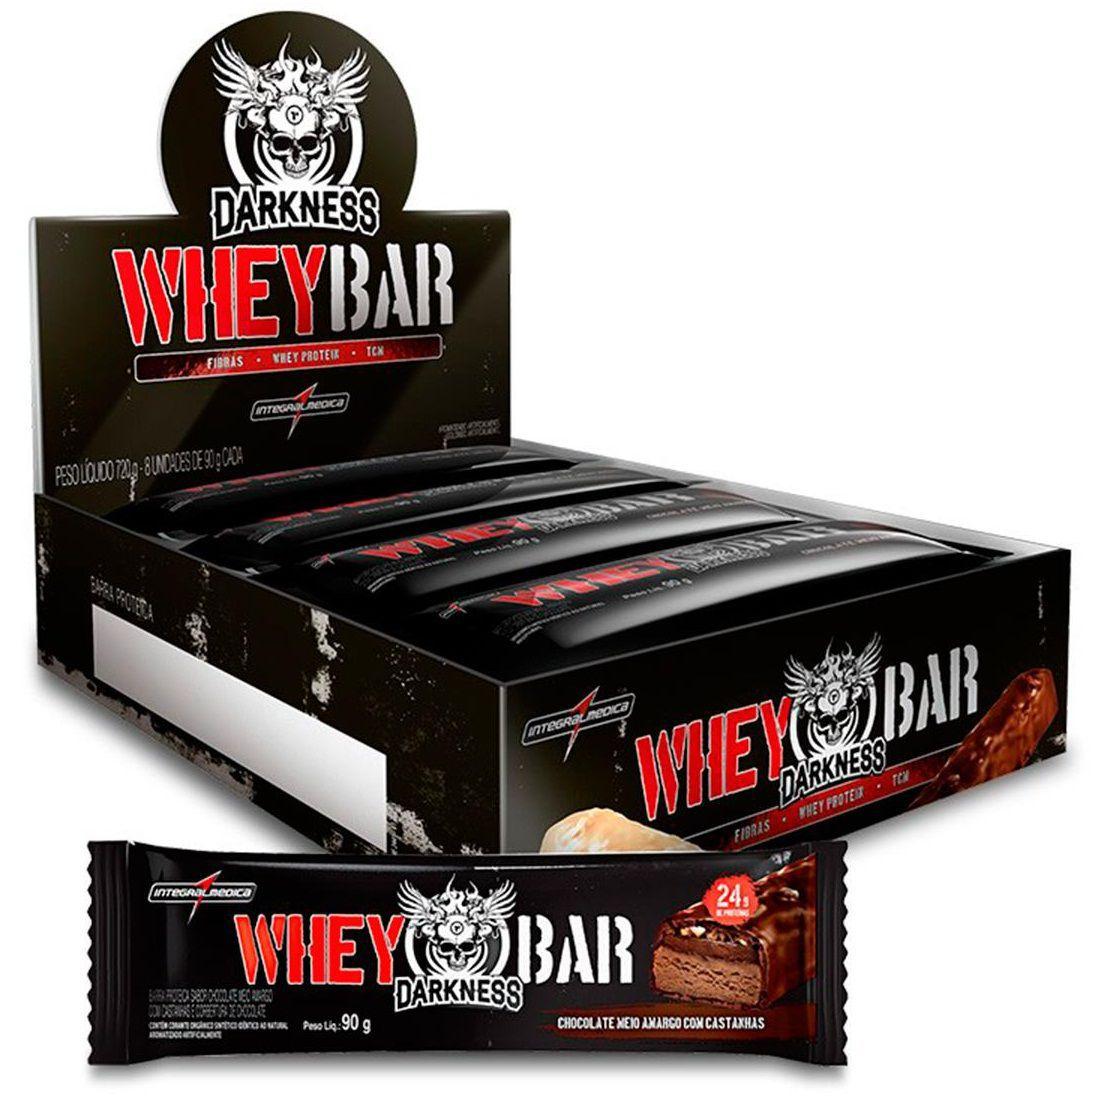 Whey Dark Bar Darkness (caixa c/ 8) - Frutas Vermelhas - IntegralMédica